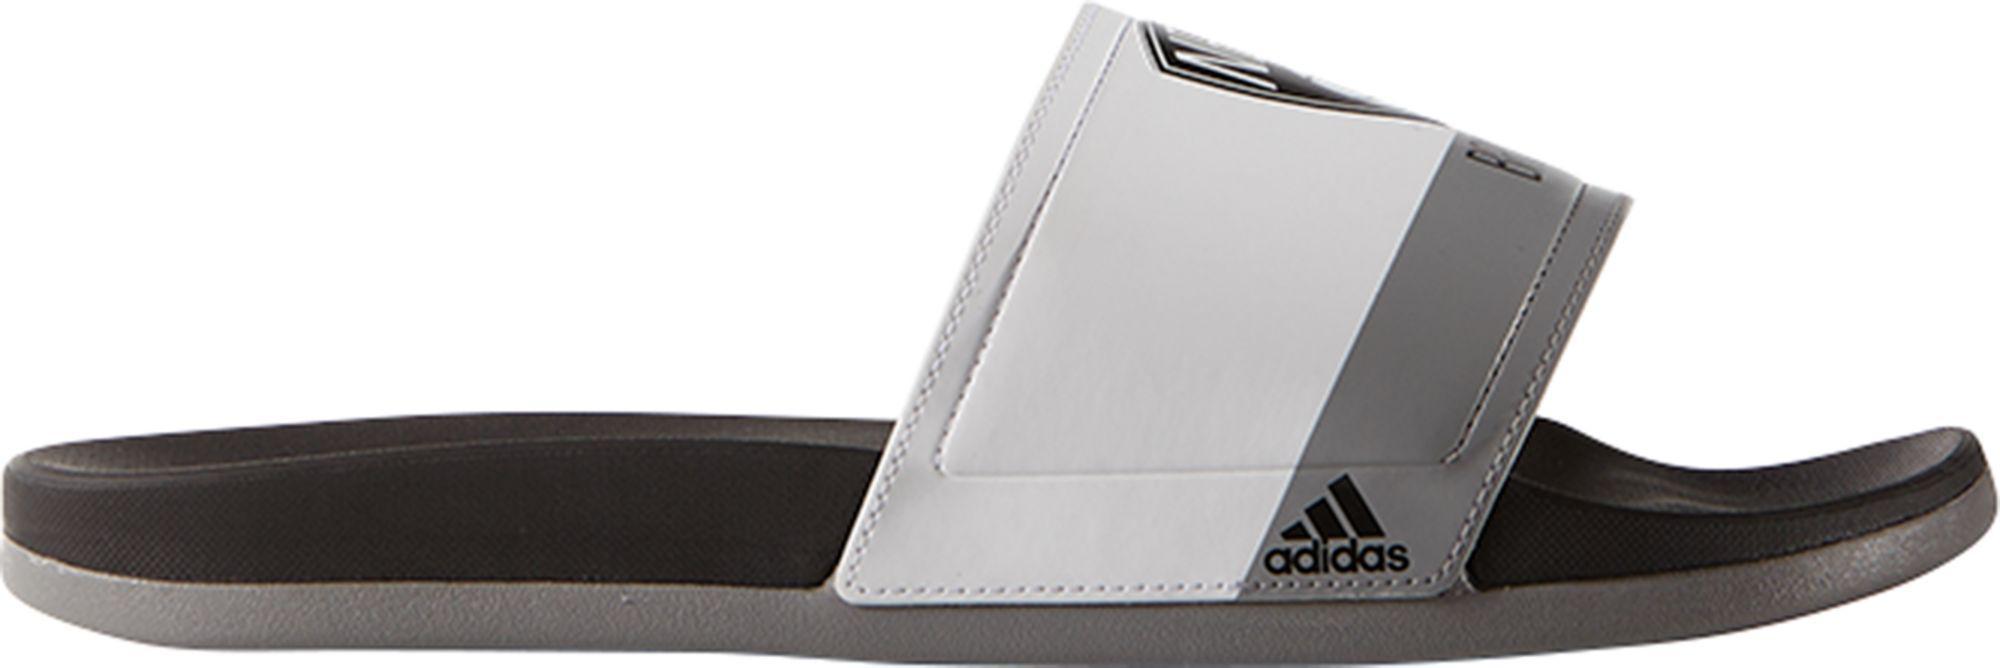 adidas. Men's Gray Adilette Brooklyn Nets Slides